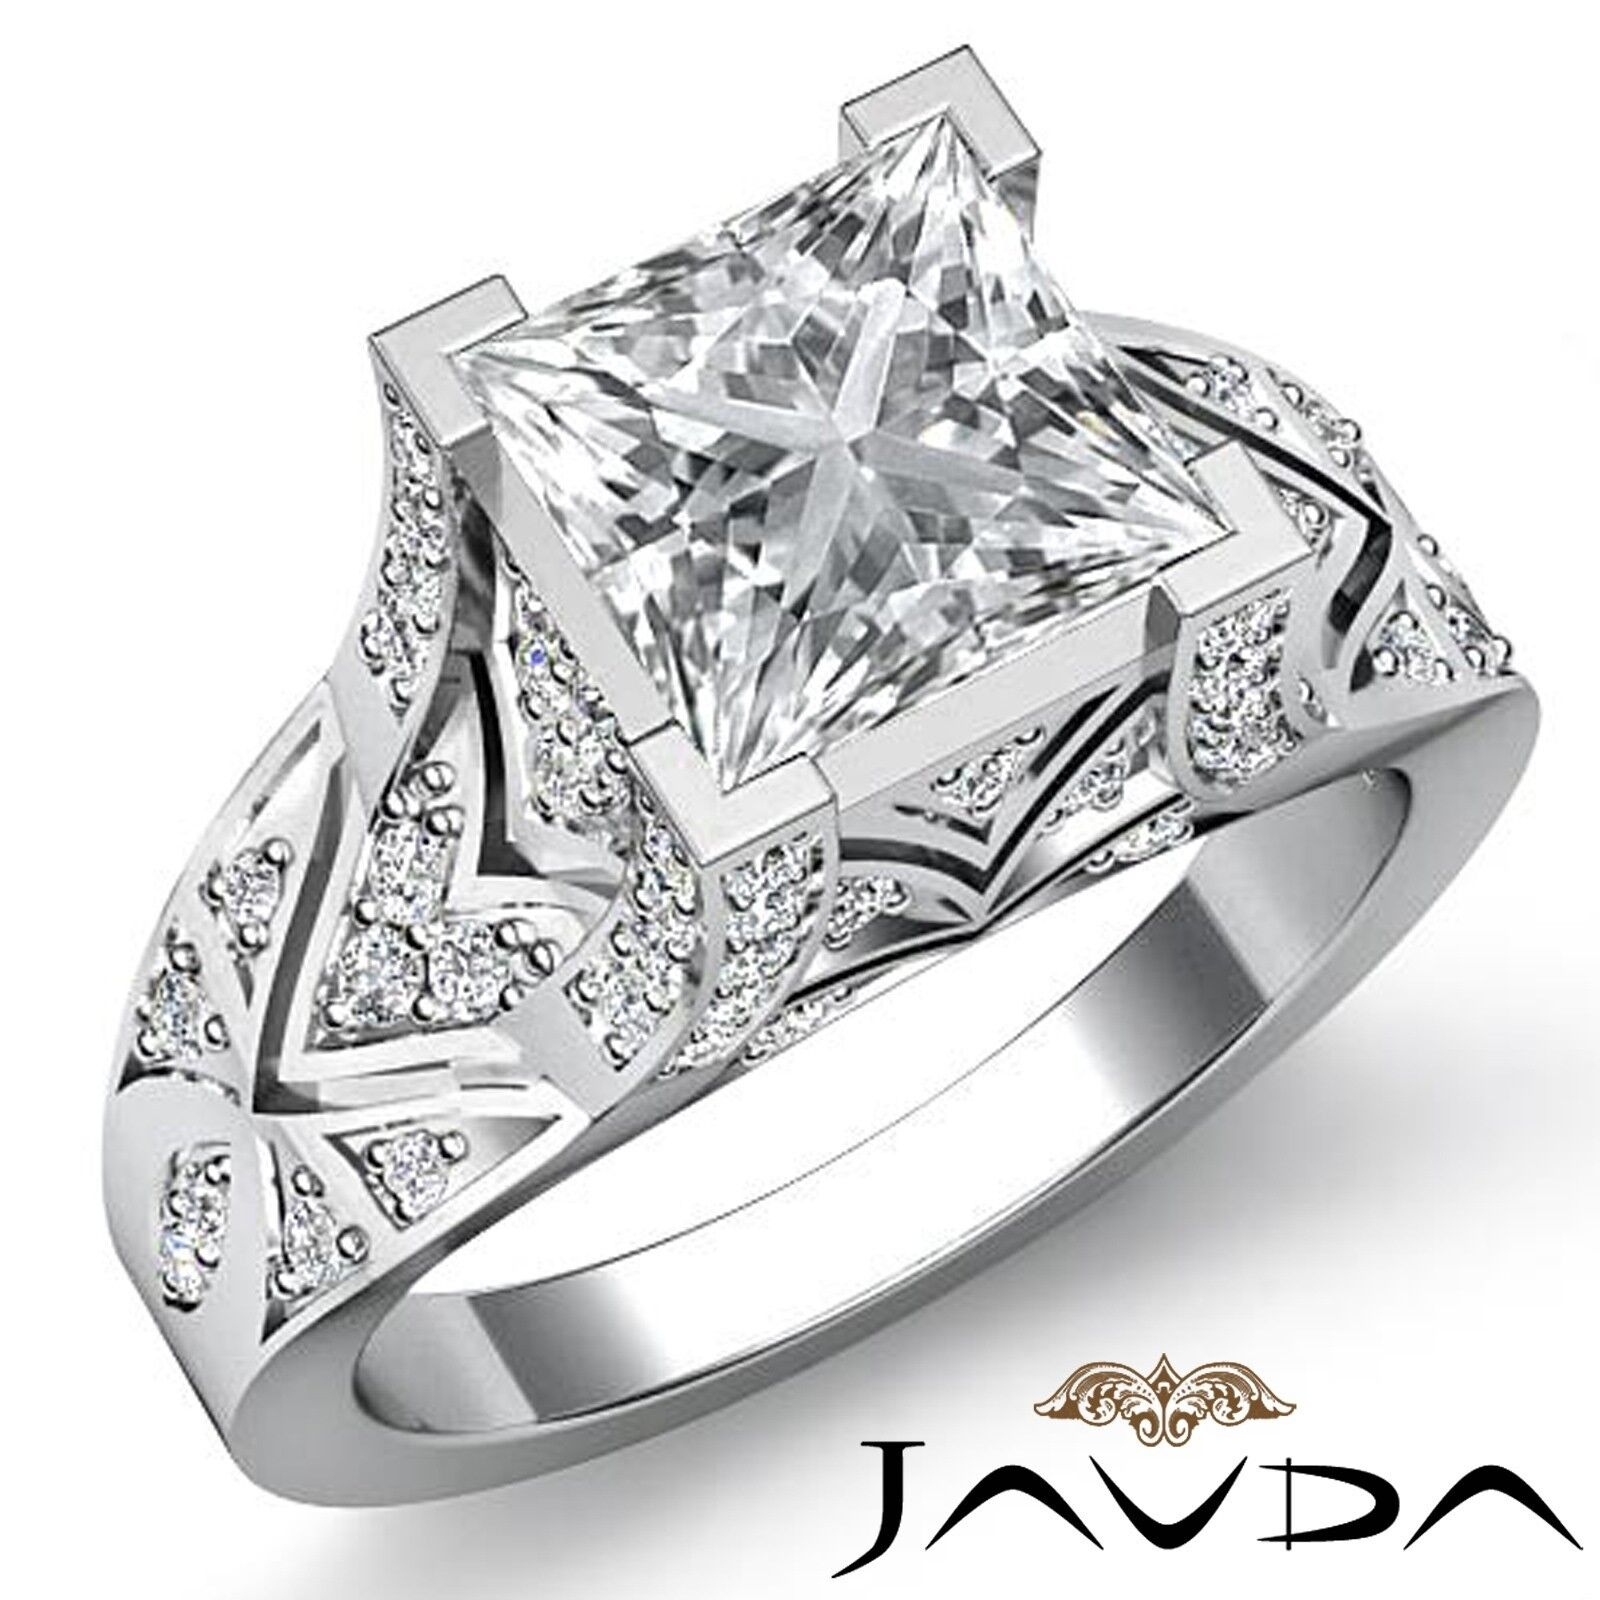 1.7ctw Antique Pave Princess Diamond  Engagement Ring GIA J-SI2 White Gold